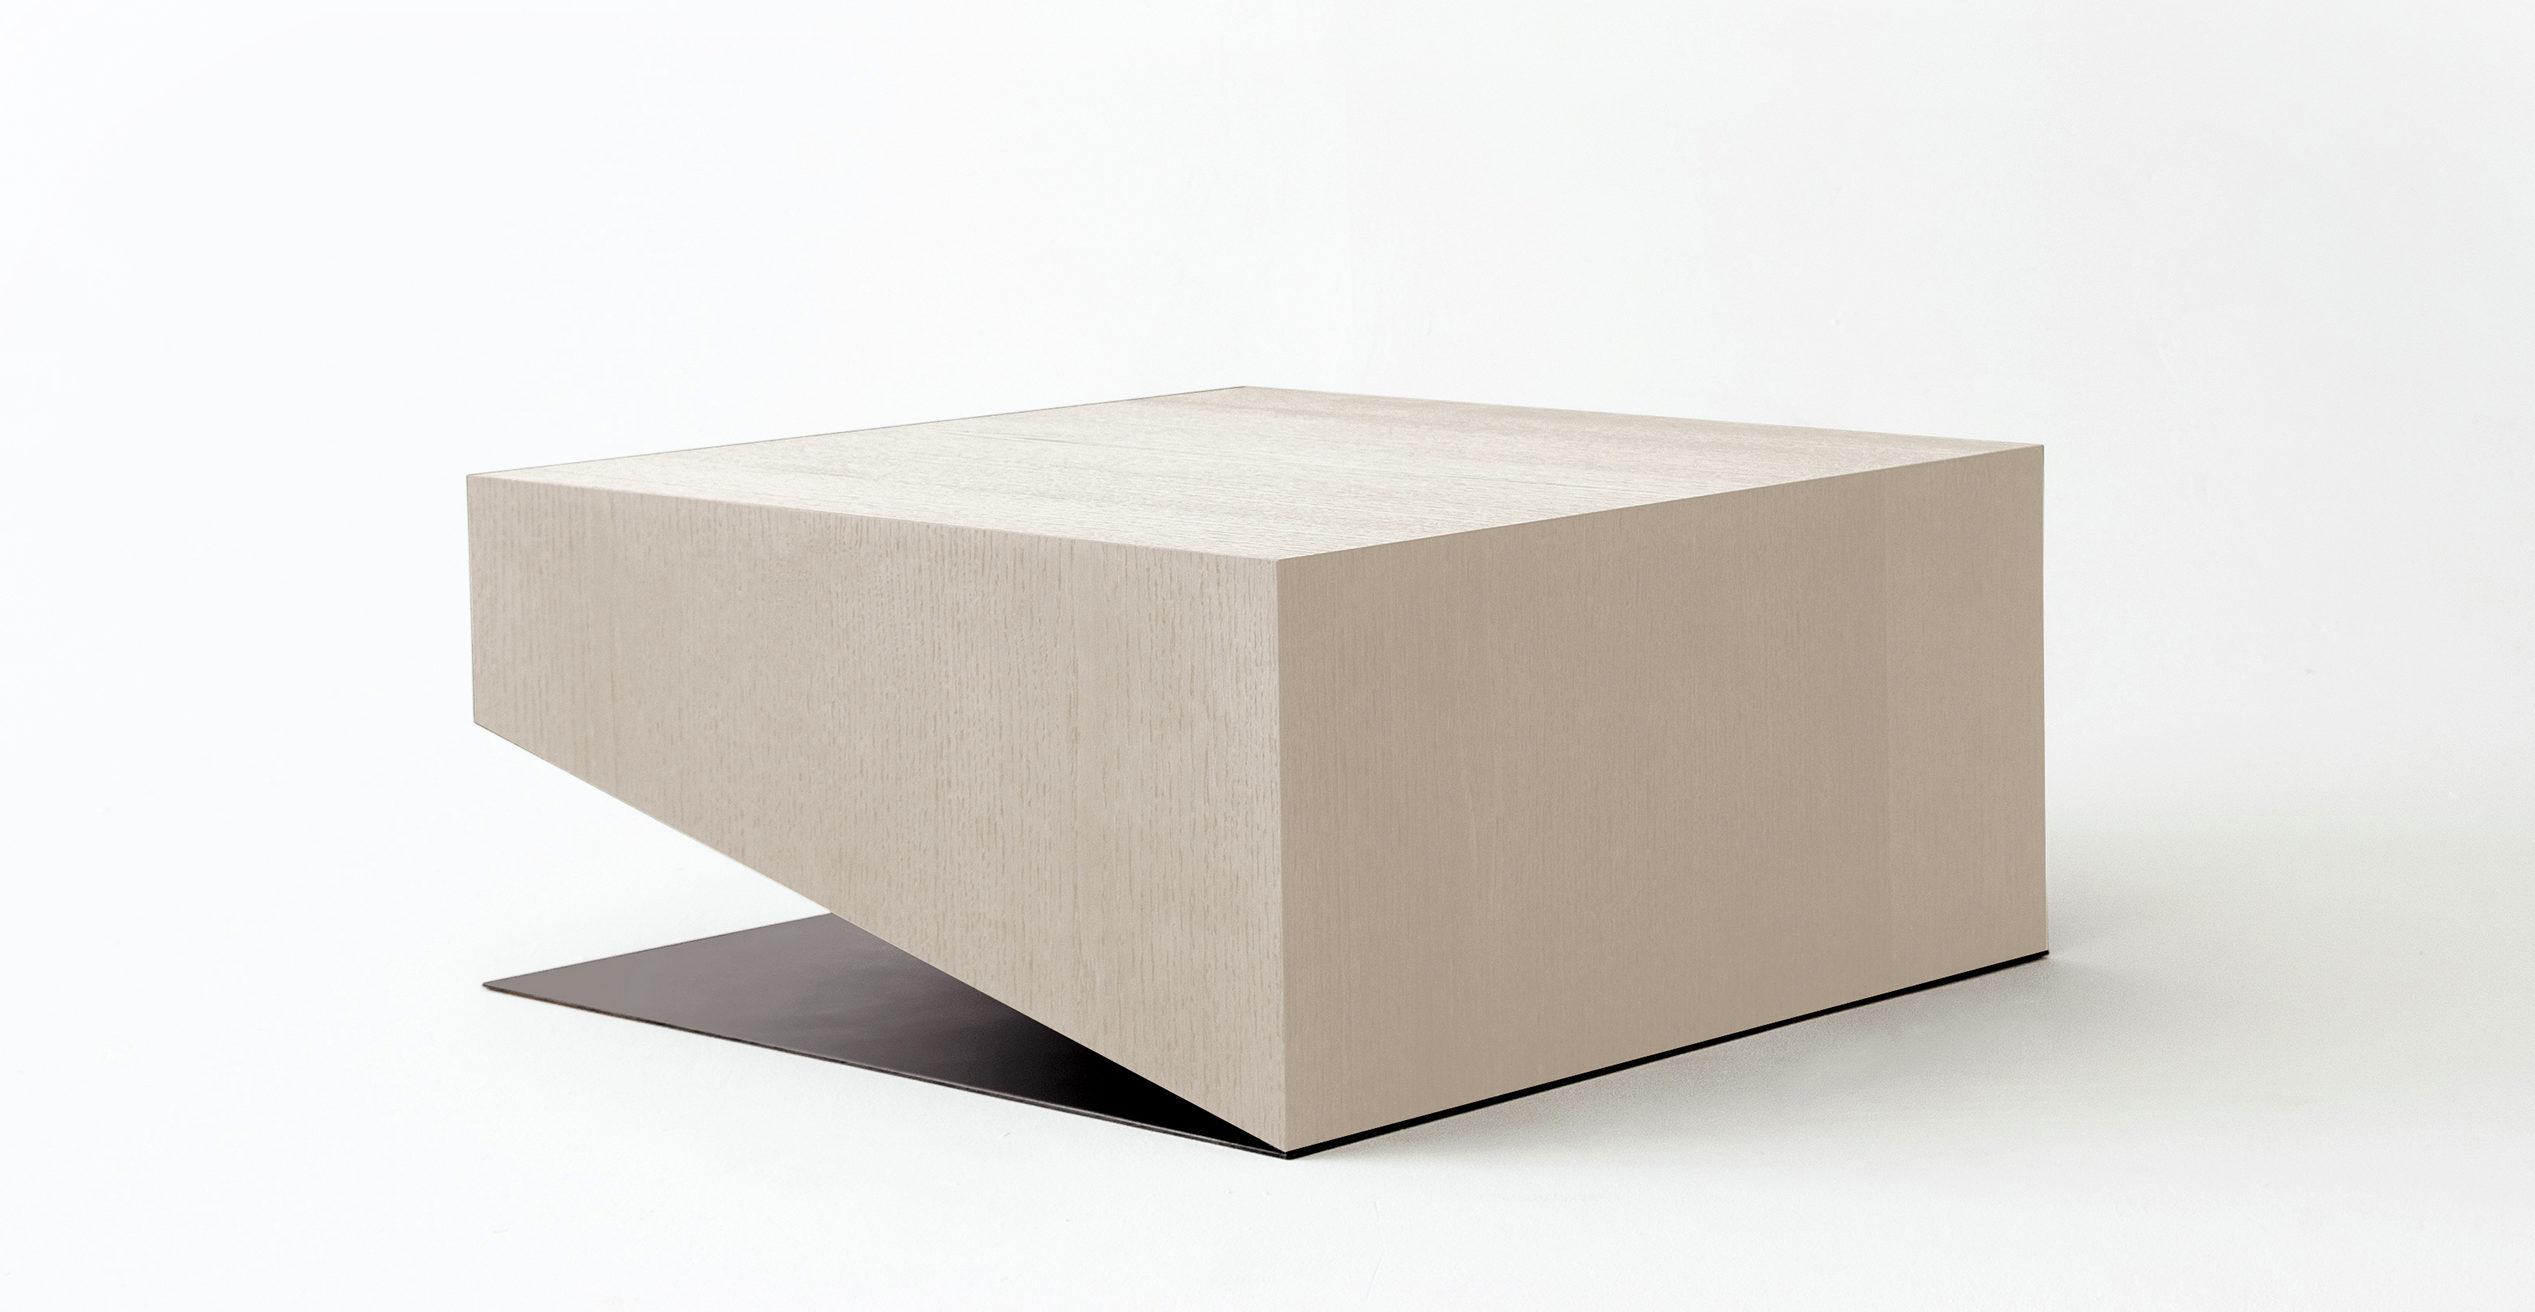 Brinkk coffee table 70